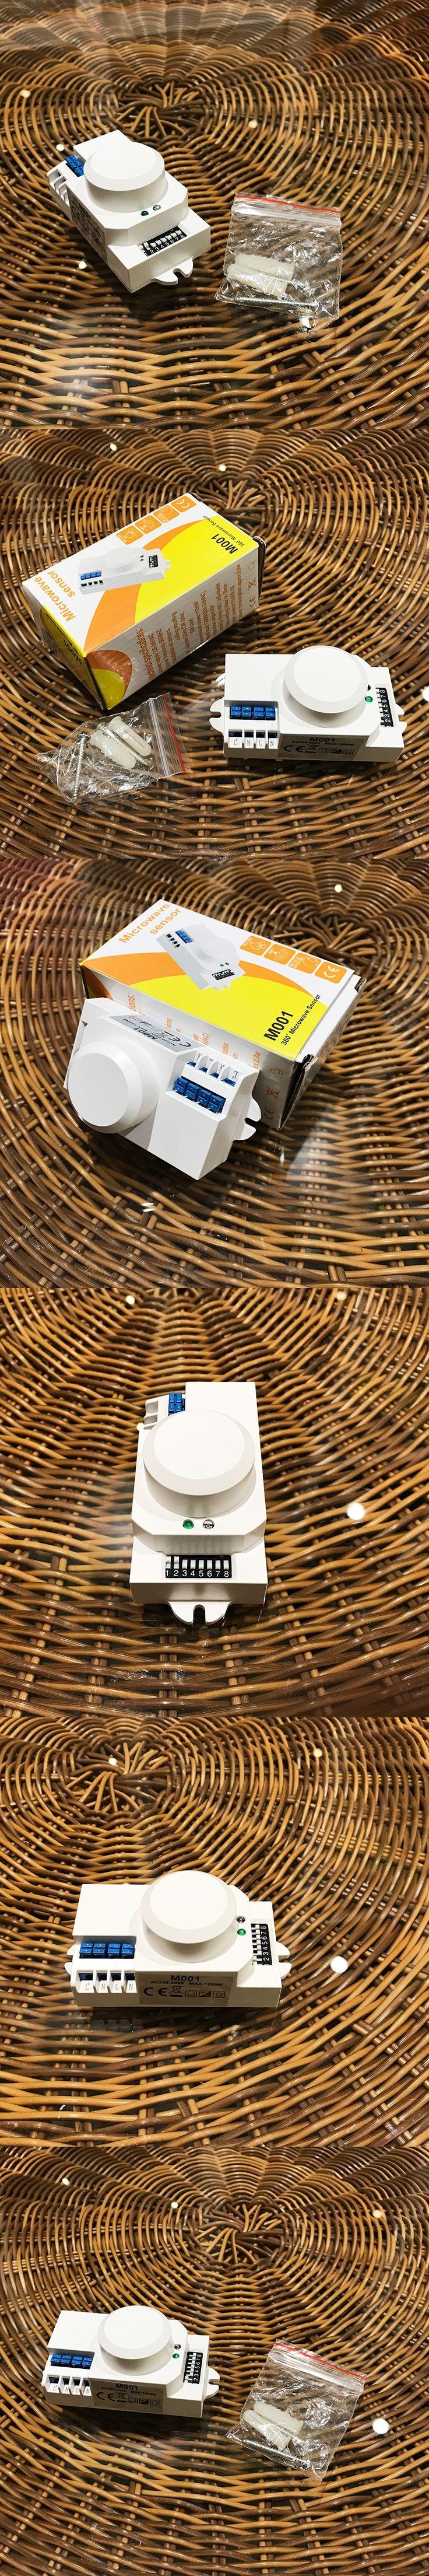 high-frequency microwave sensor 220v 360 degree Microwave Sensor Light Switch Induction Microwave Motion Sensor Max 1200w CM096